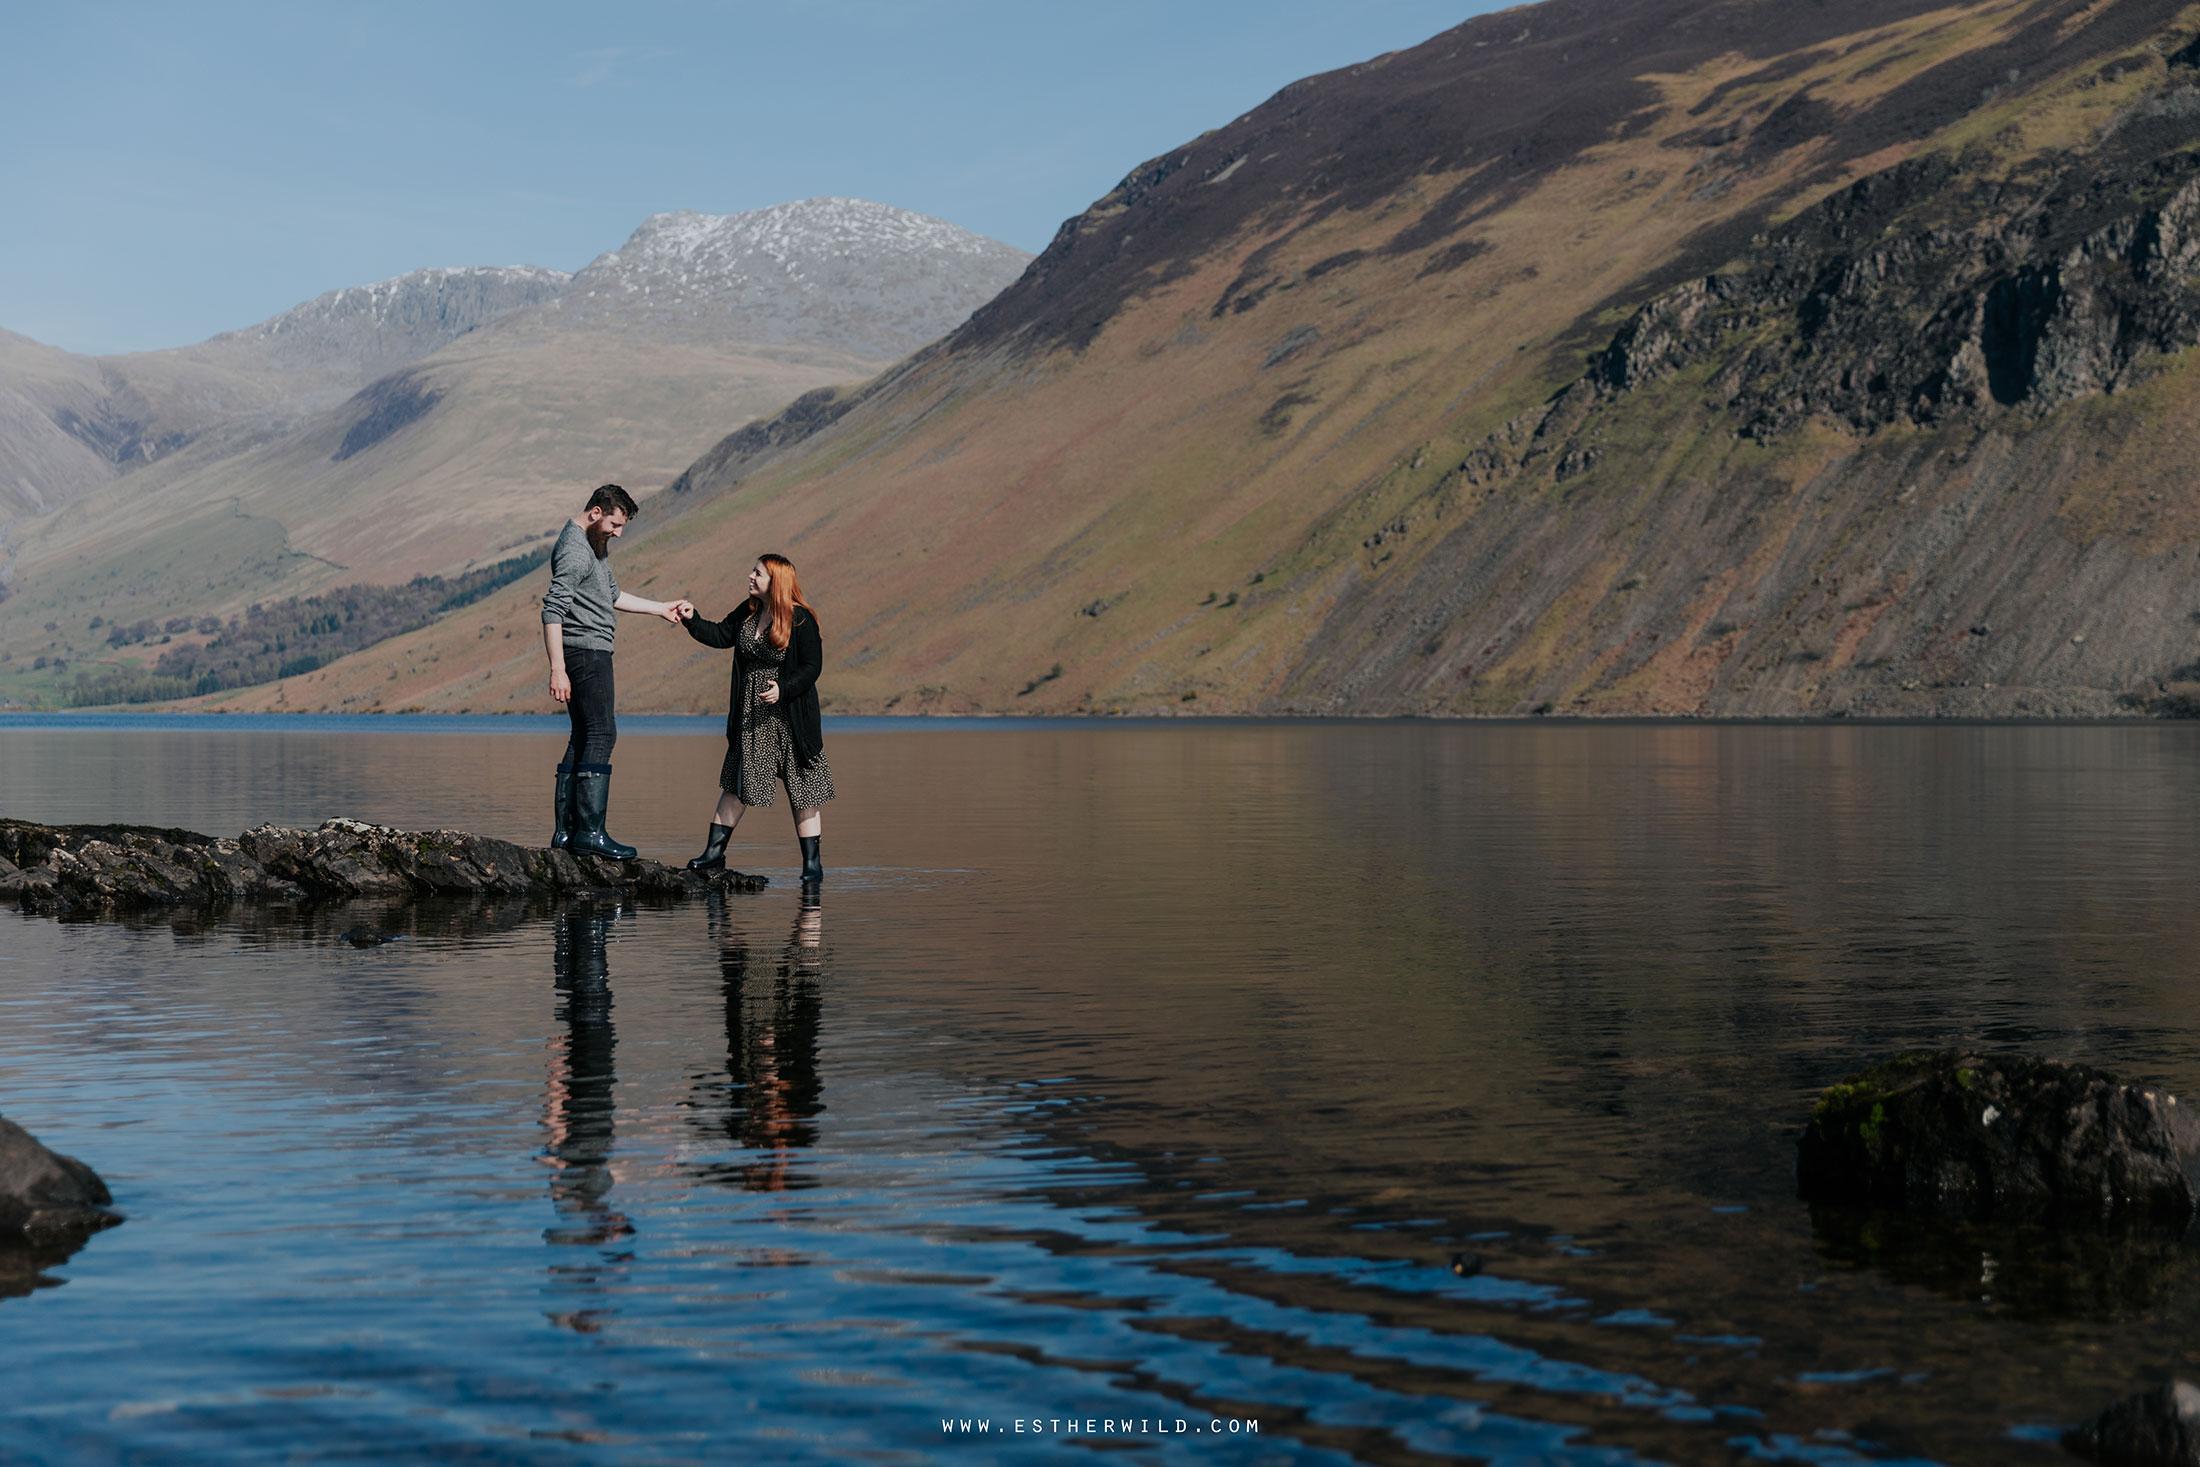 Cumbria_Lake_District_Wasdale_Wedding_Photographer_Destination_Engagement_Anniversary_Esther_Wild_IMG_3263.jpg